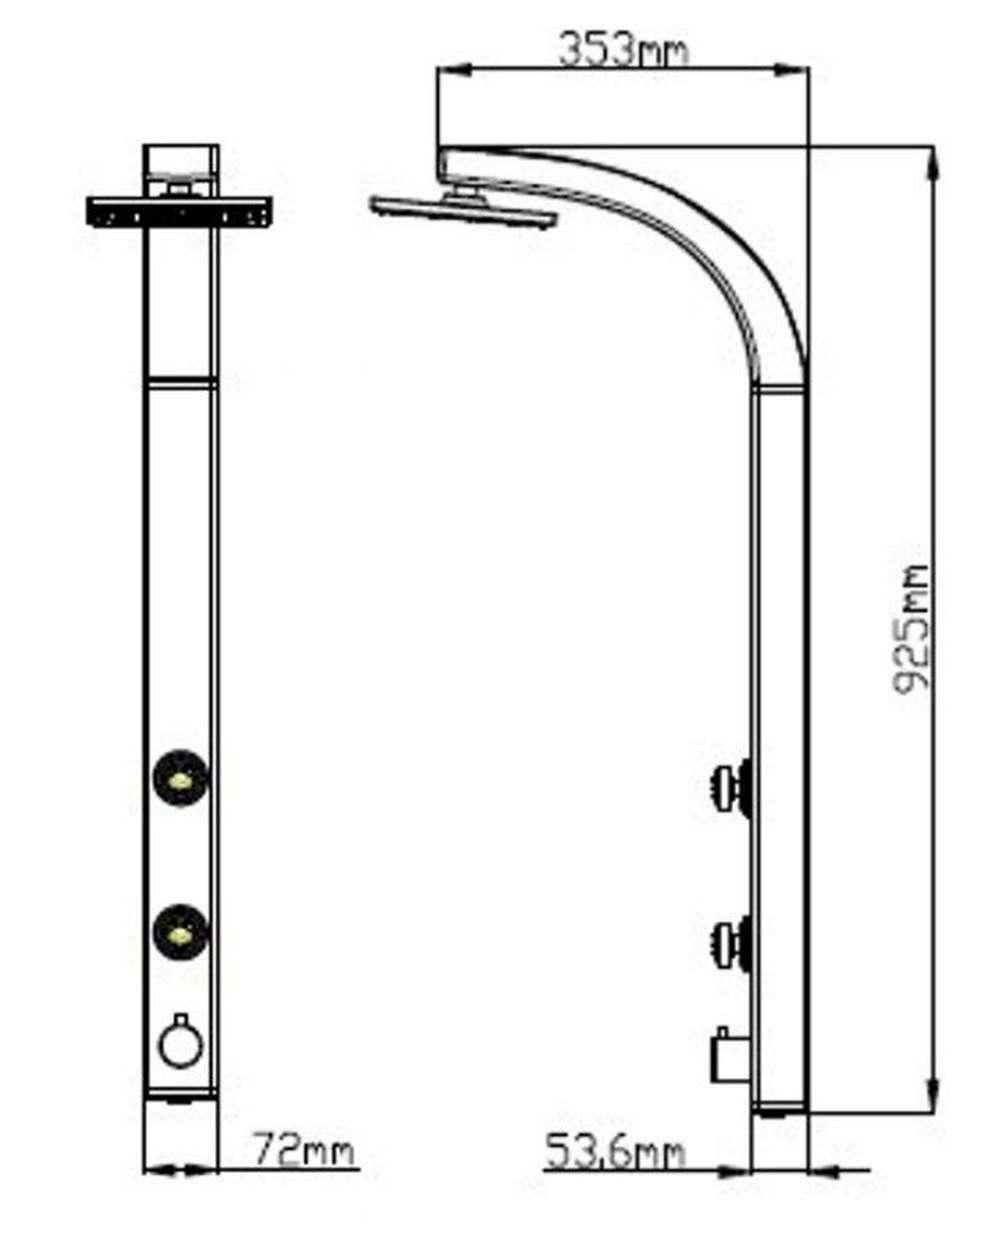 duschpaneel regendusche duscharmatur duschs ule dusche brause badarmatur silber ebay. Black Bedroom Furniture Sets. Home Design Ideas